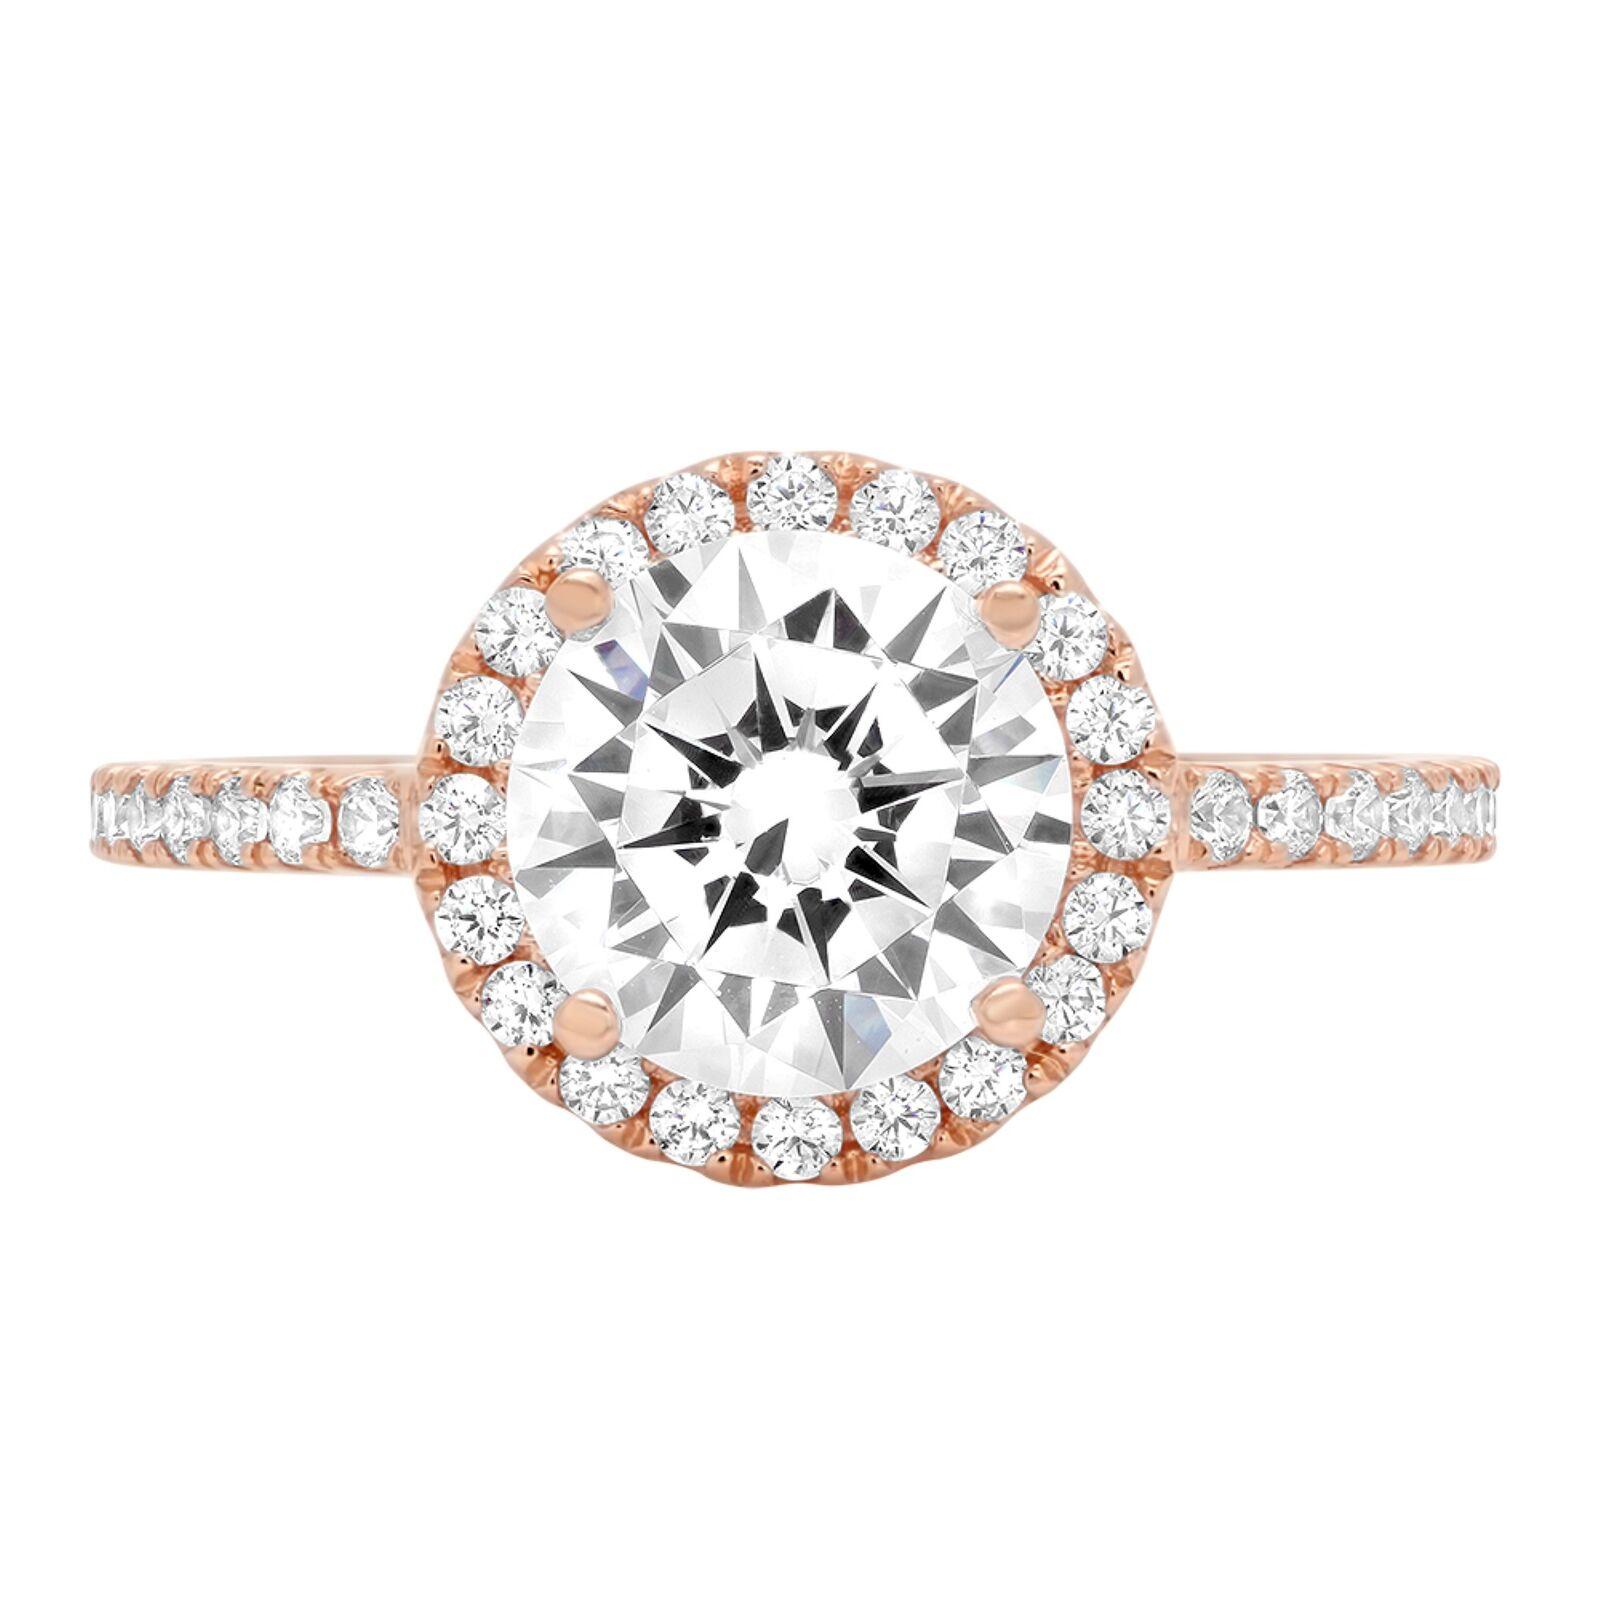 1.95ct Round Cut Halo Wedding Promise Engagement Bridal Ring 14k pink gold